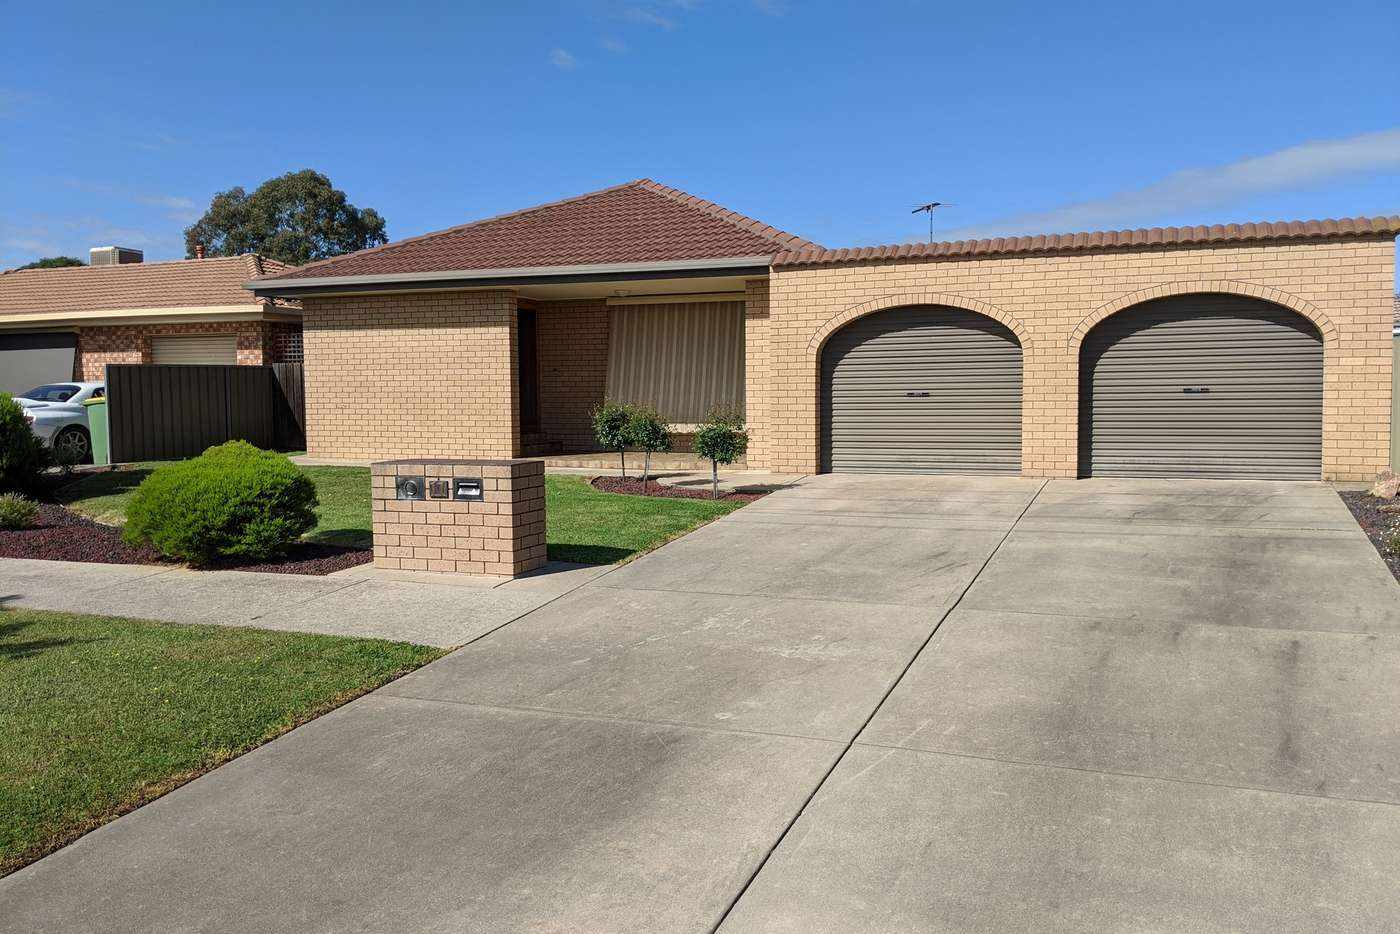 Main view of Homely house listing, 11 Roadshow Drive, Wodonga VIC 3690